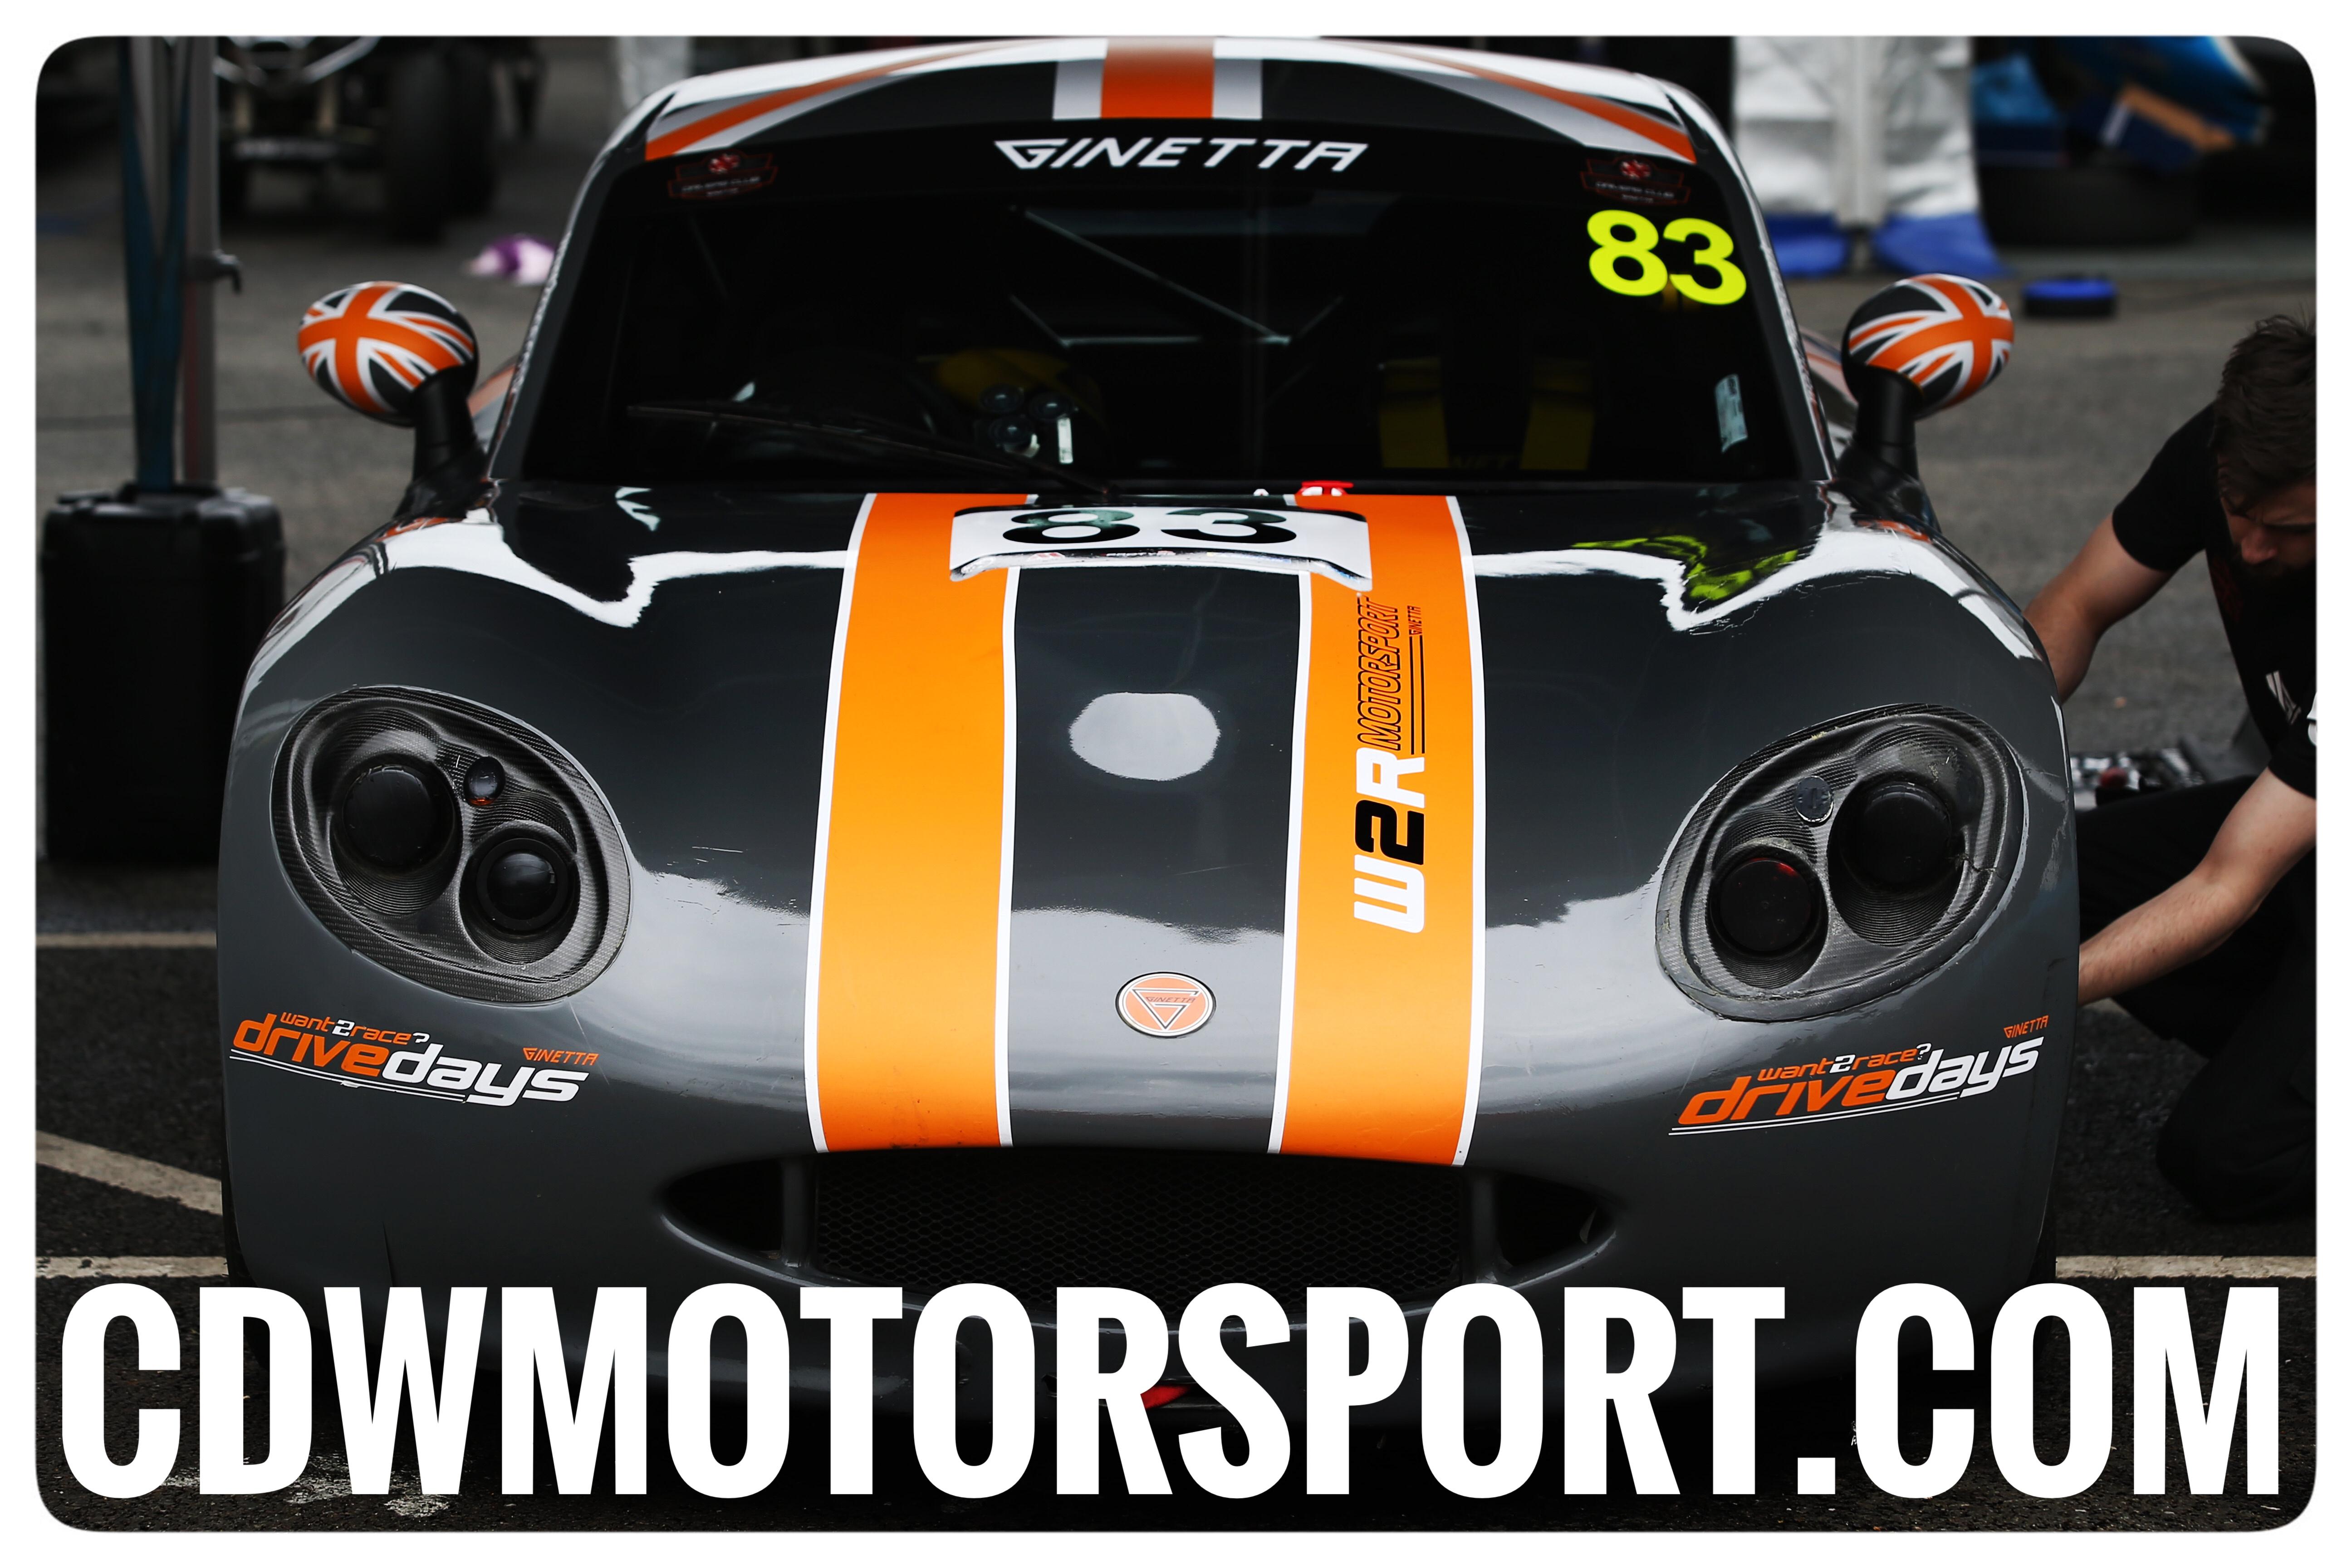 CDW Motorsport